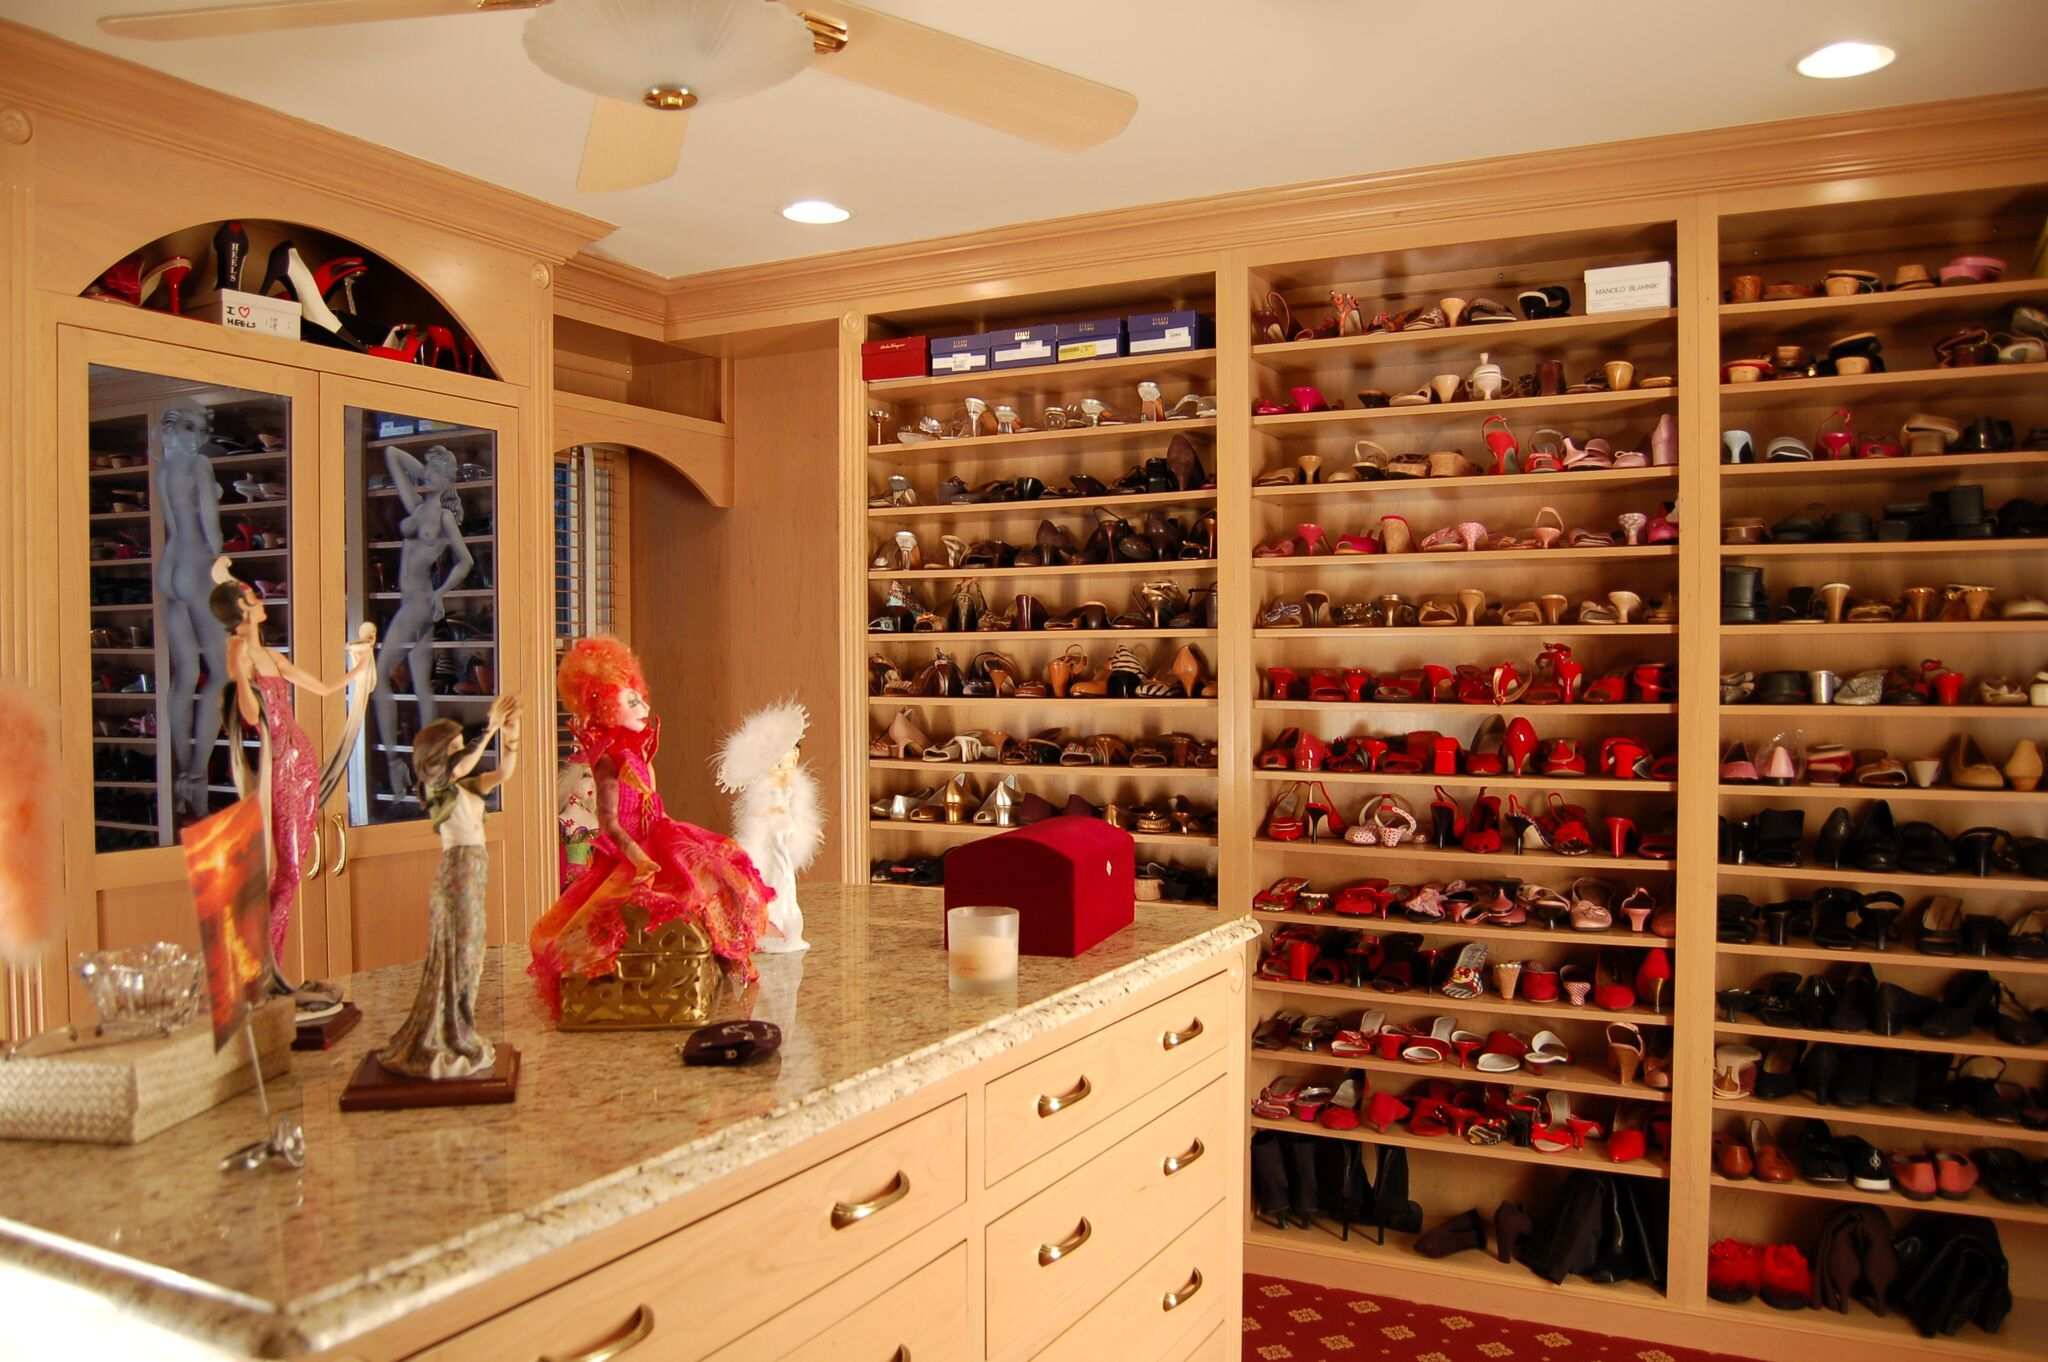 Custom Shoe Storage By Ridgewood Closets In Saddle Brook, NJ  Www.ridgewoodclosets.com